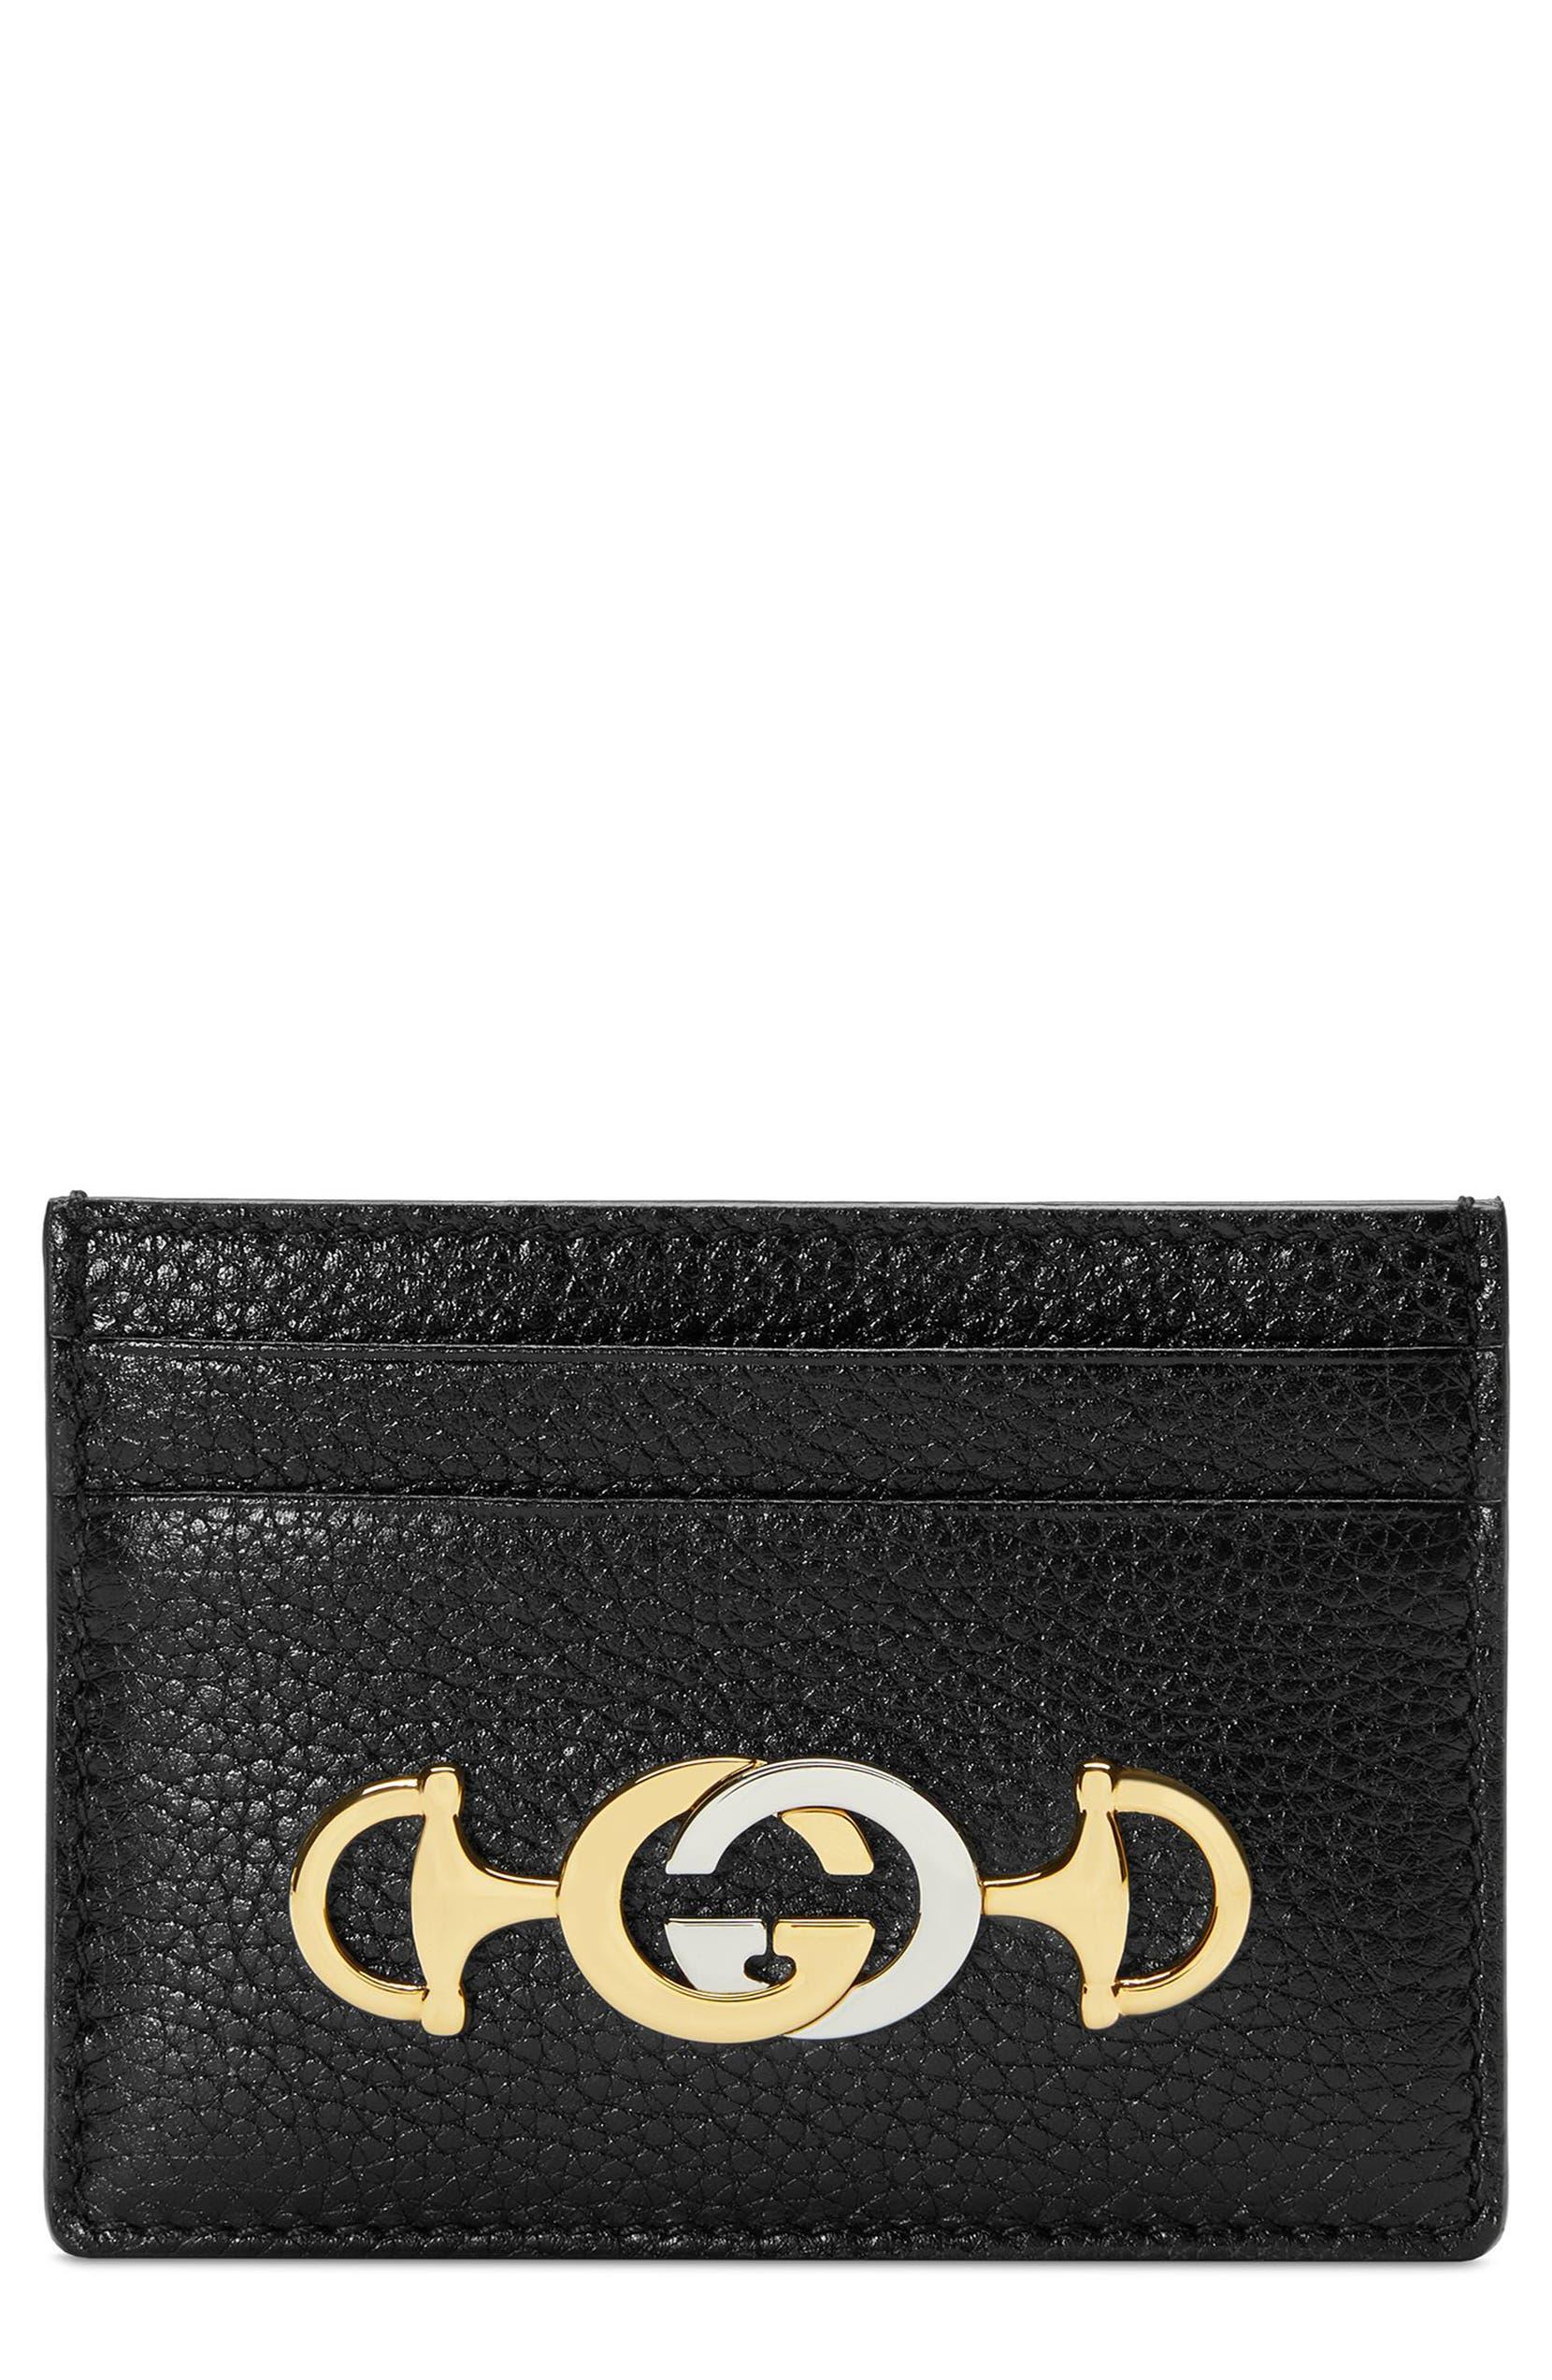 6852b55bfc7f Gucci Zumi 463 Leather Card Case | Nordstrom